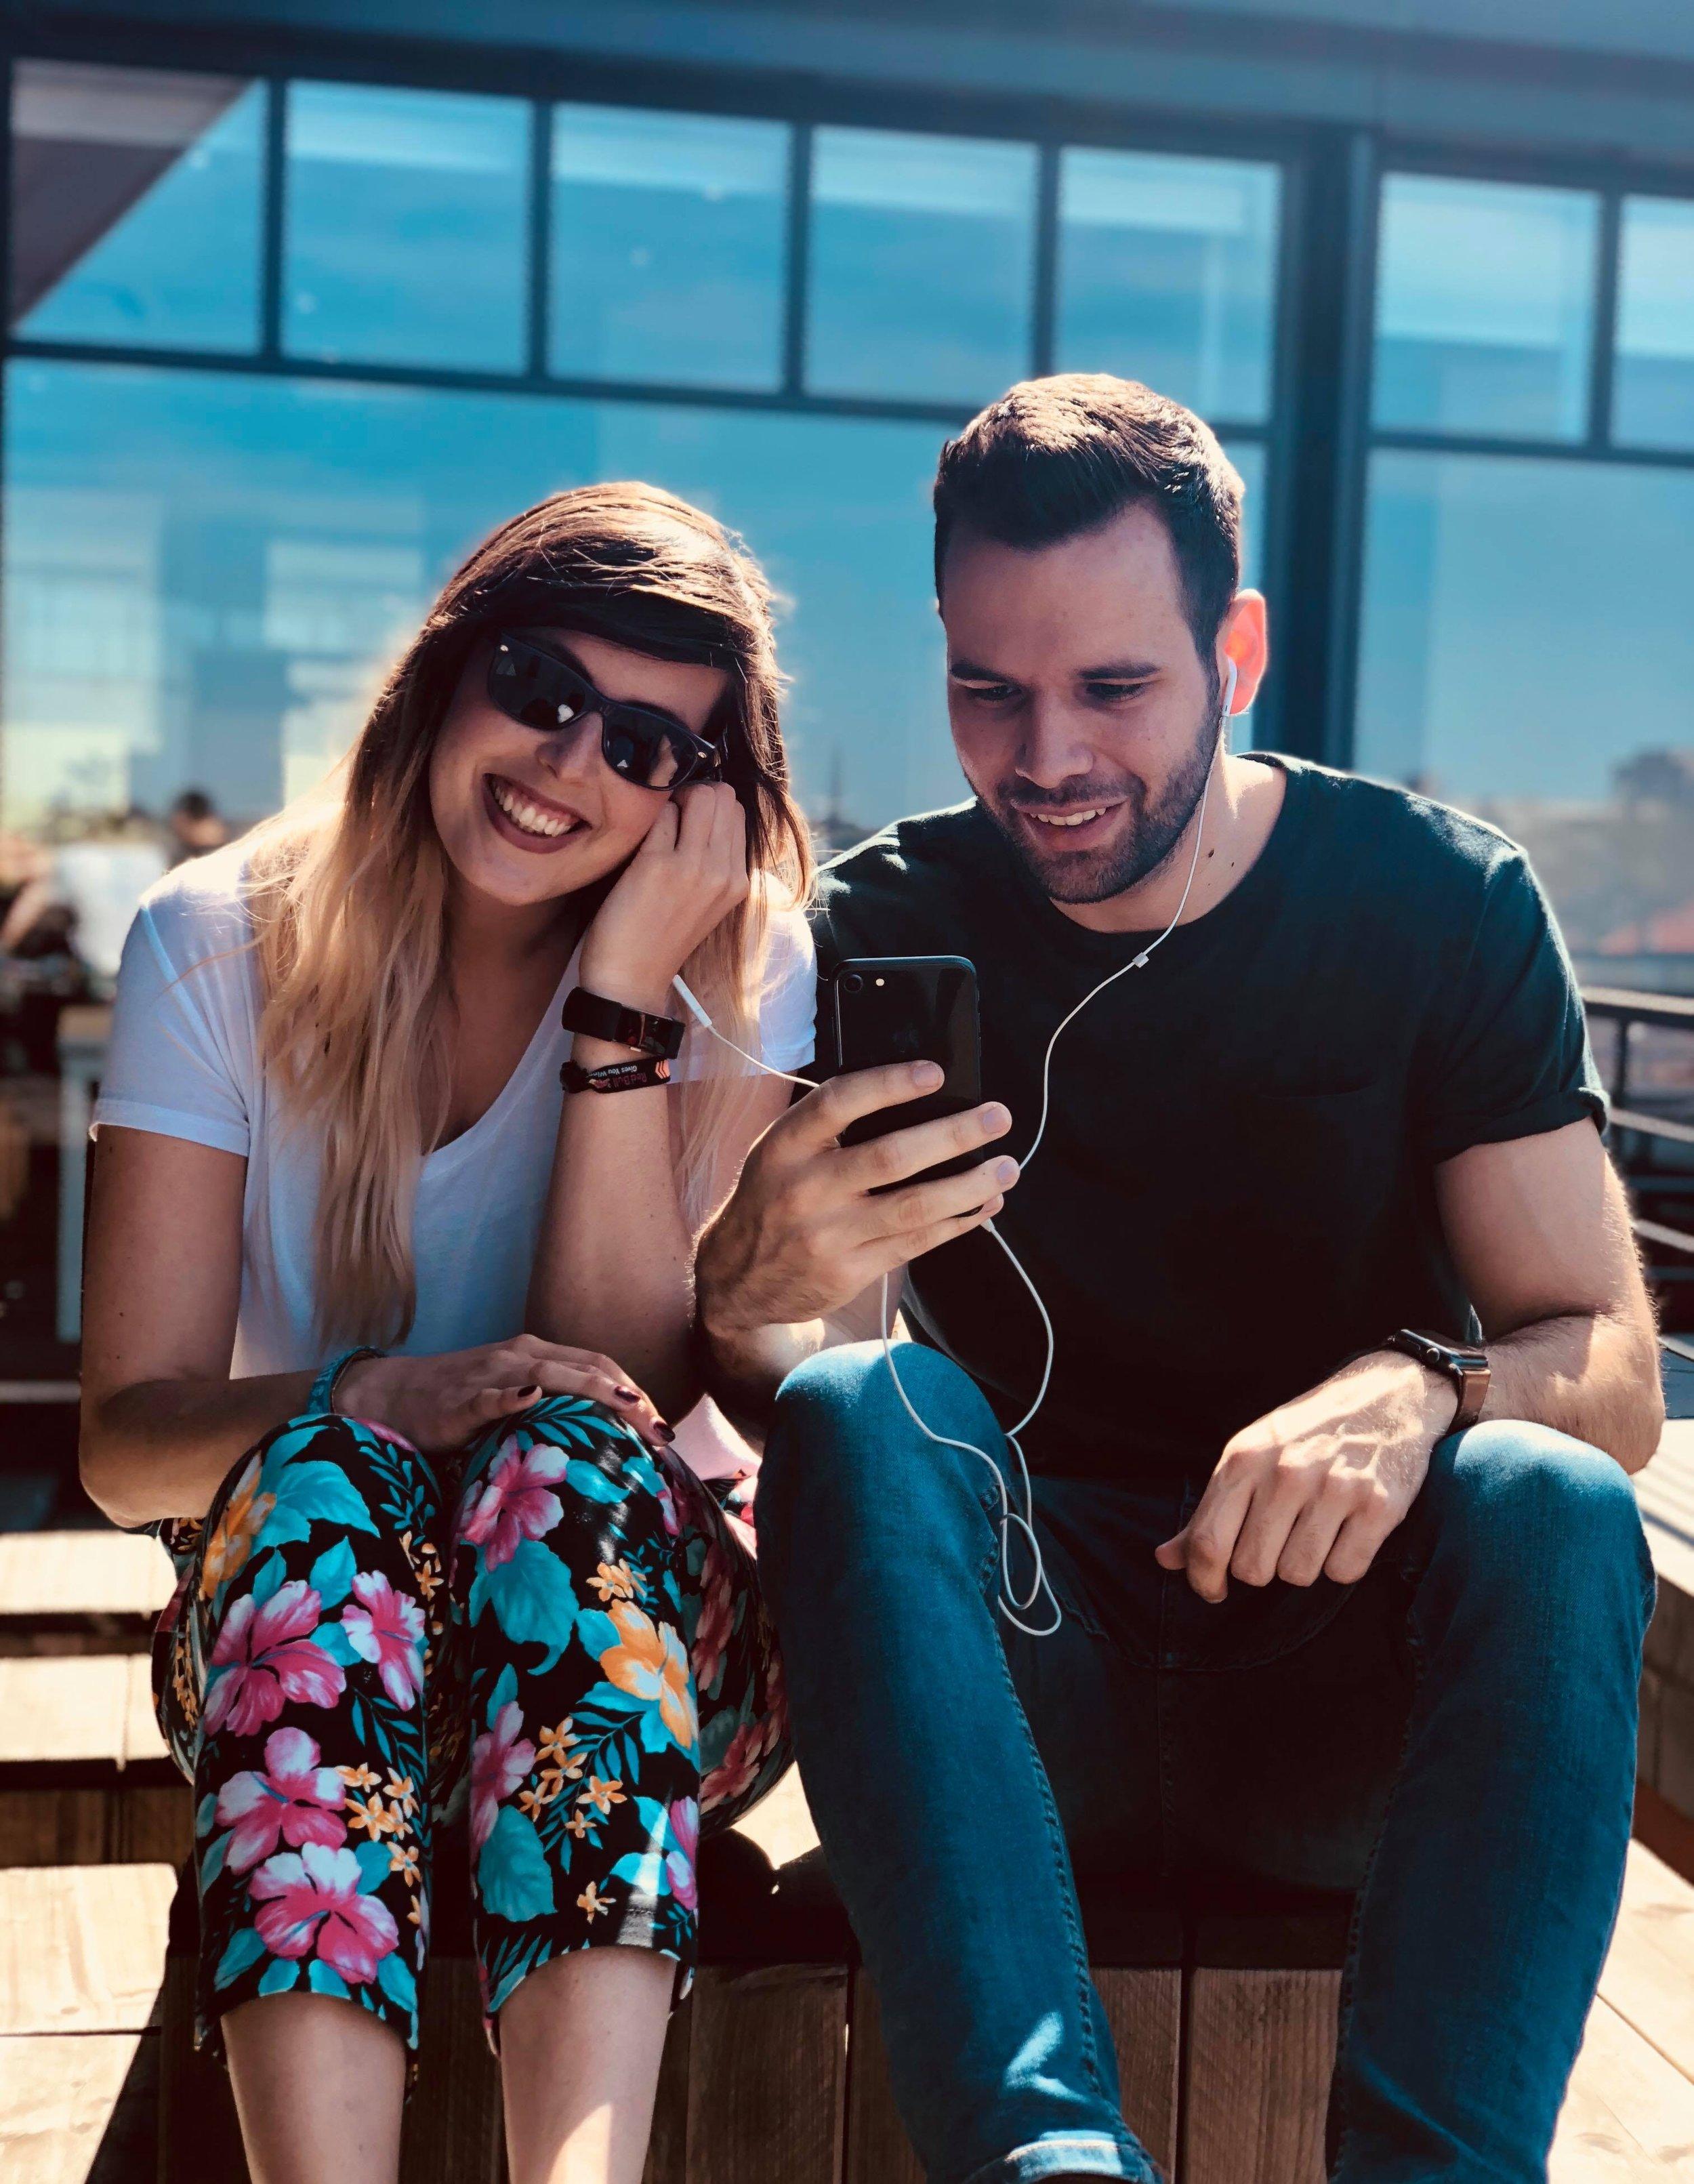 man-woman-listen-together.jpg